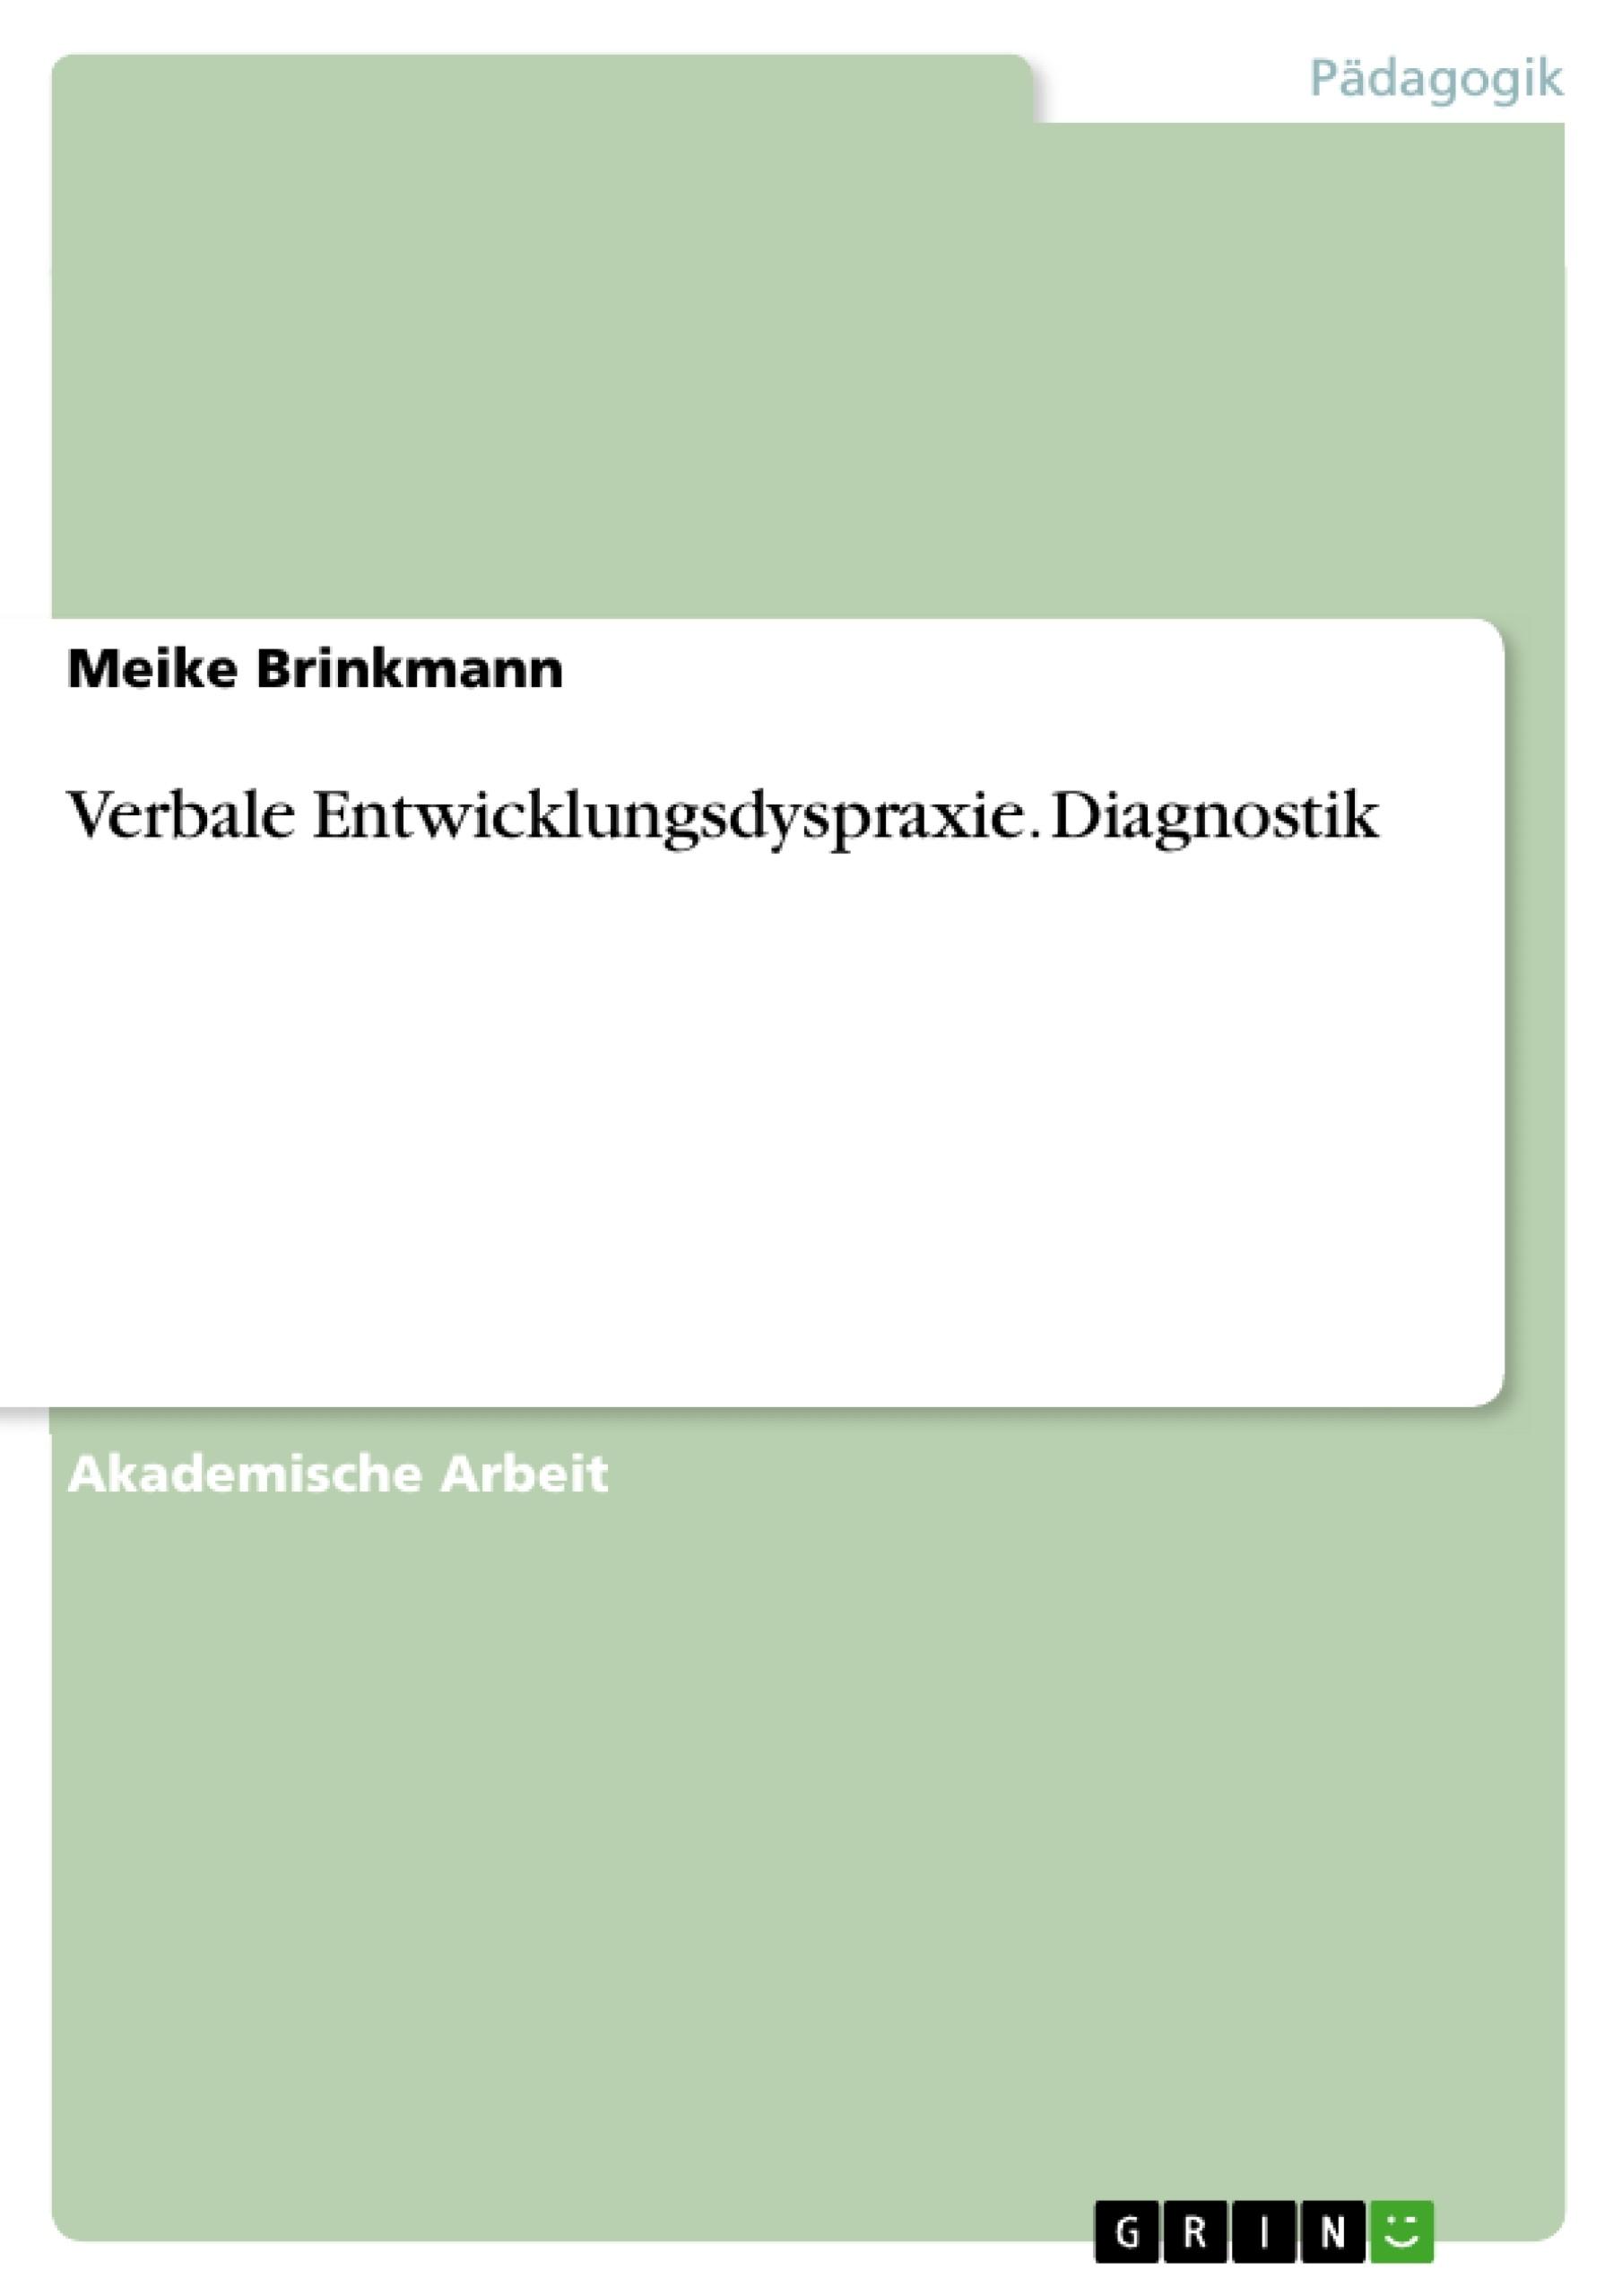 Titel: Verbale Entwicklungsdyspraxie. Diagnostik